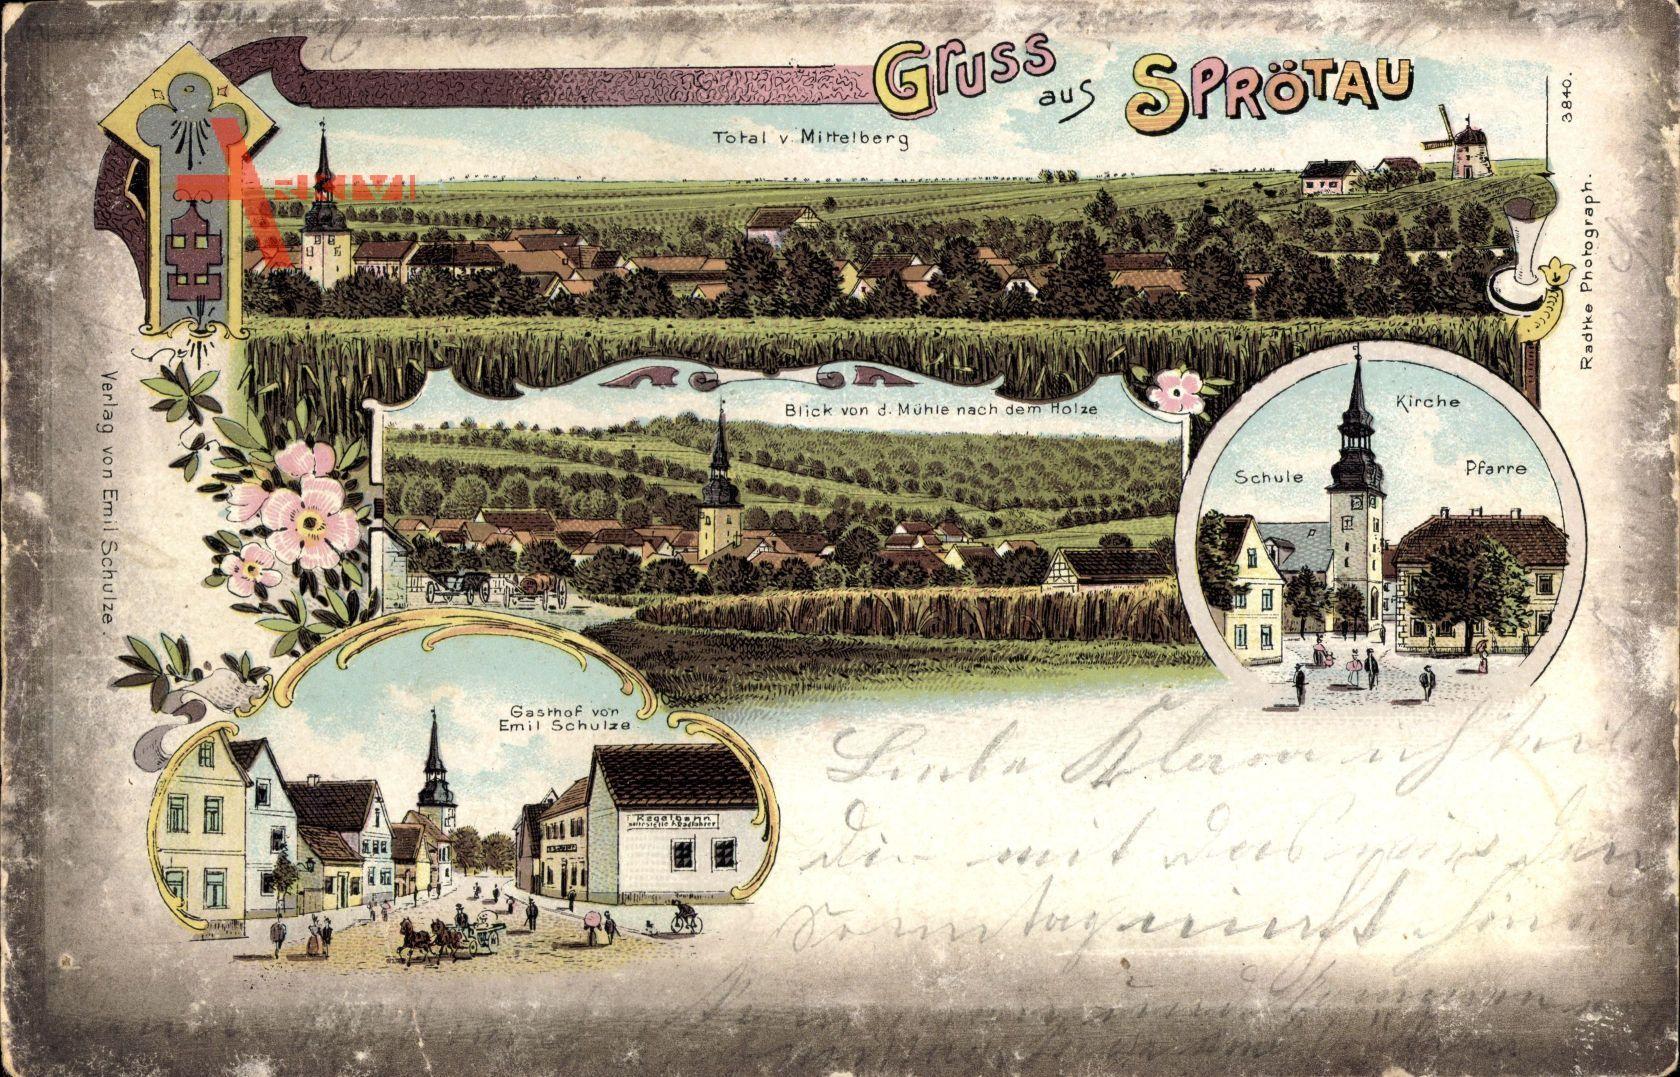 Sprötau Thüringen, Kirche, Schule, Pfarre, Gasthof Schulze